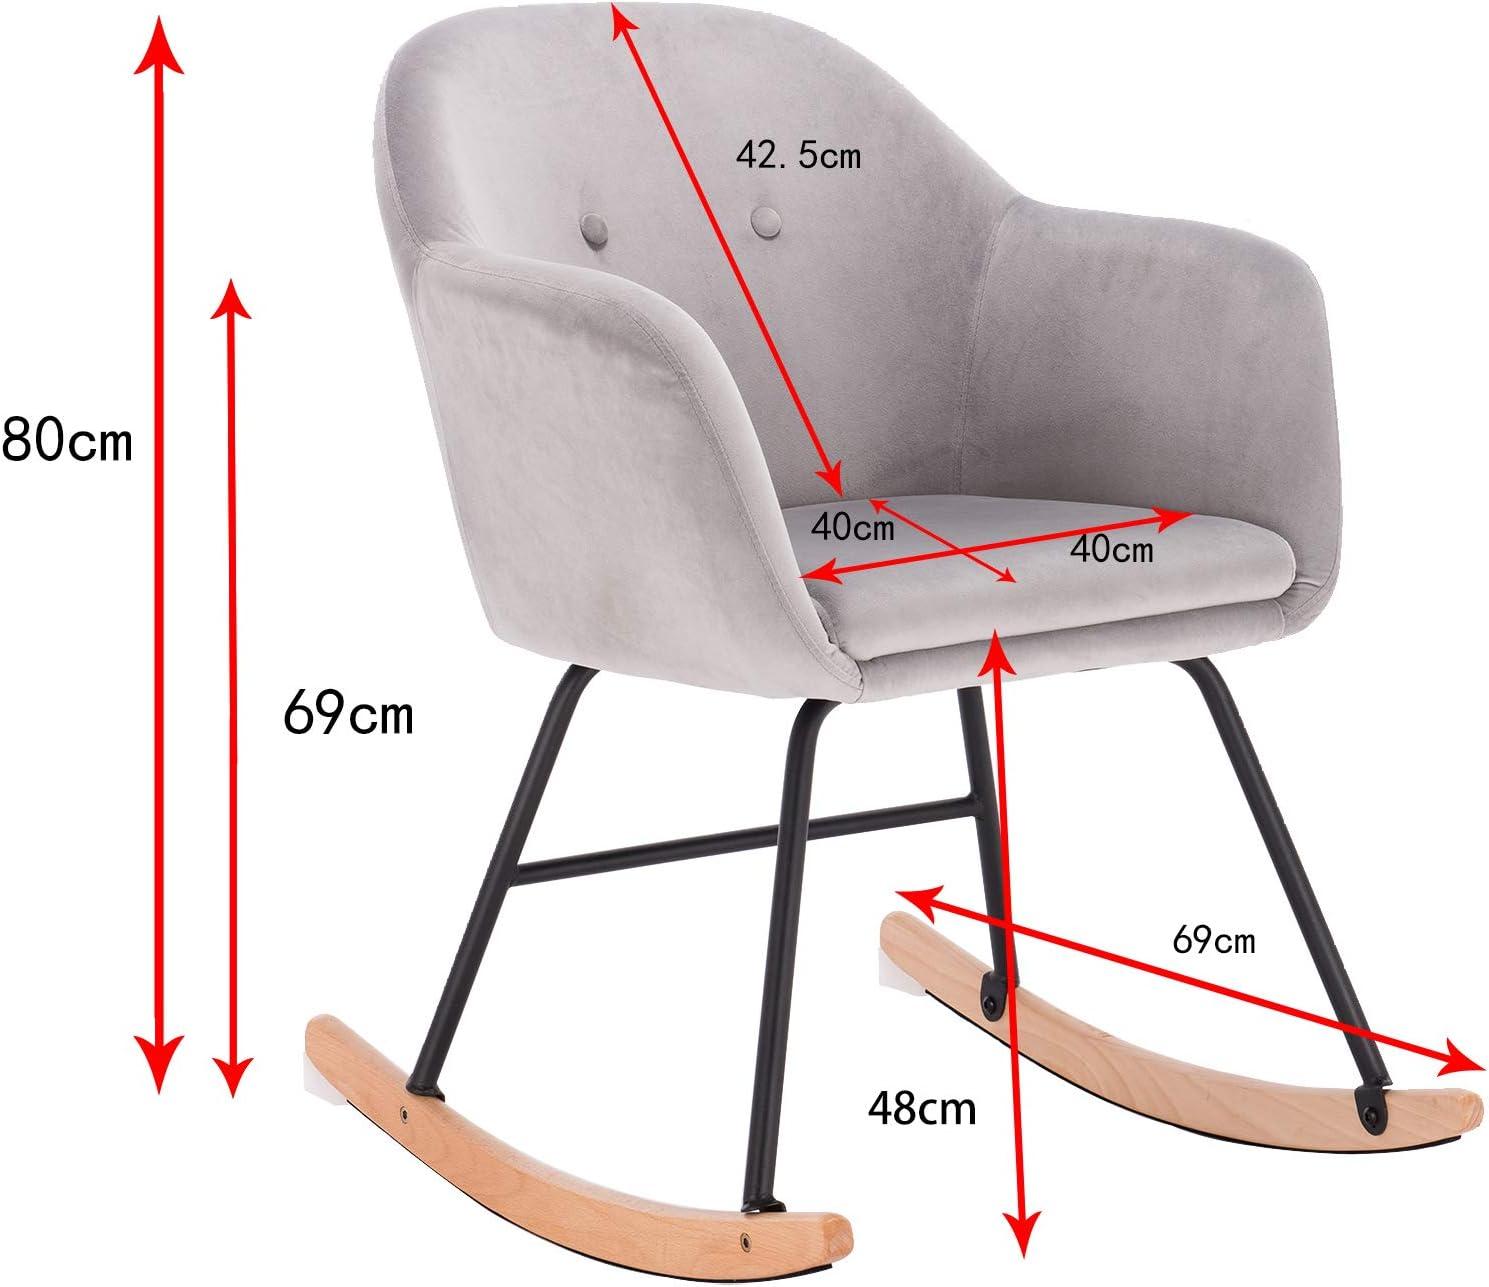 eSituro Rocking Chair Cream Lounge Chair Relax Chair Retro Rocker Leisure Armchair Outdoor Sun Patio Garden Tulip Tub Chair Light Grey